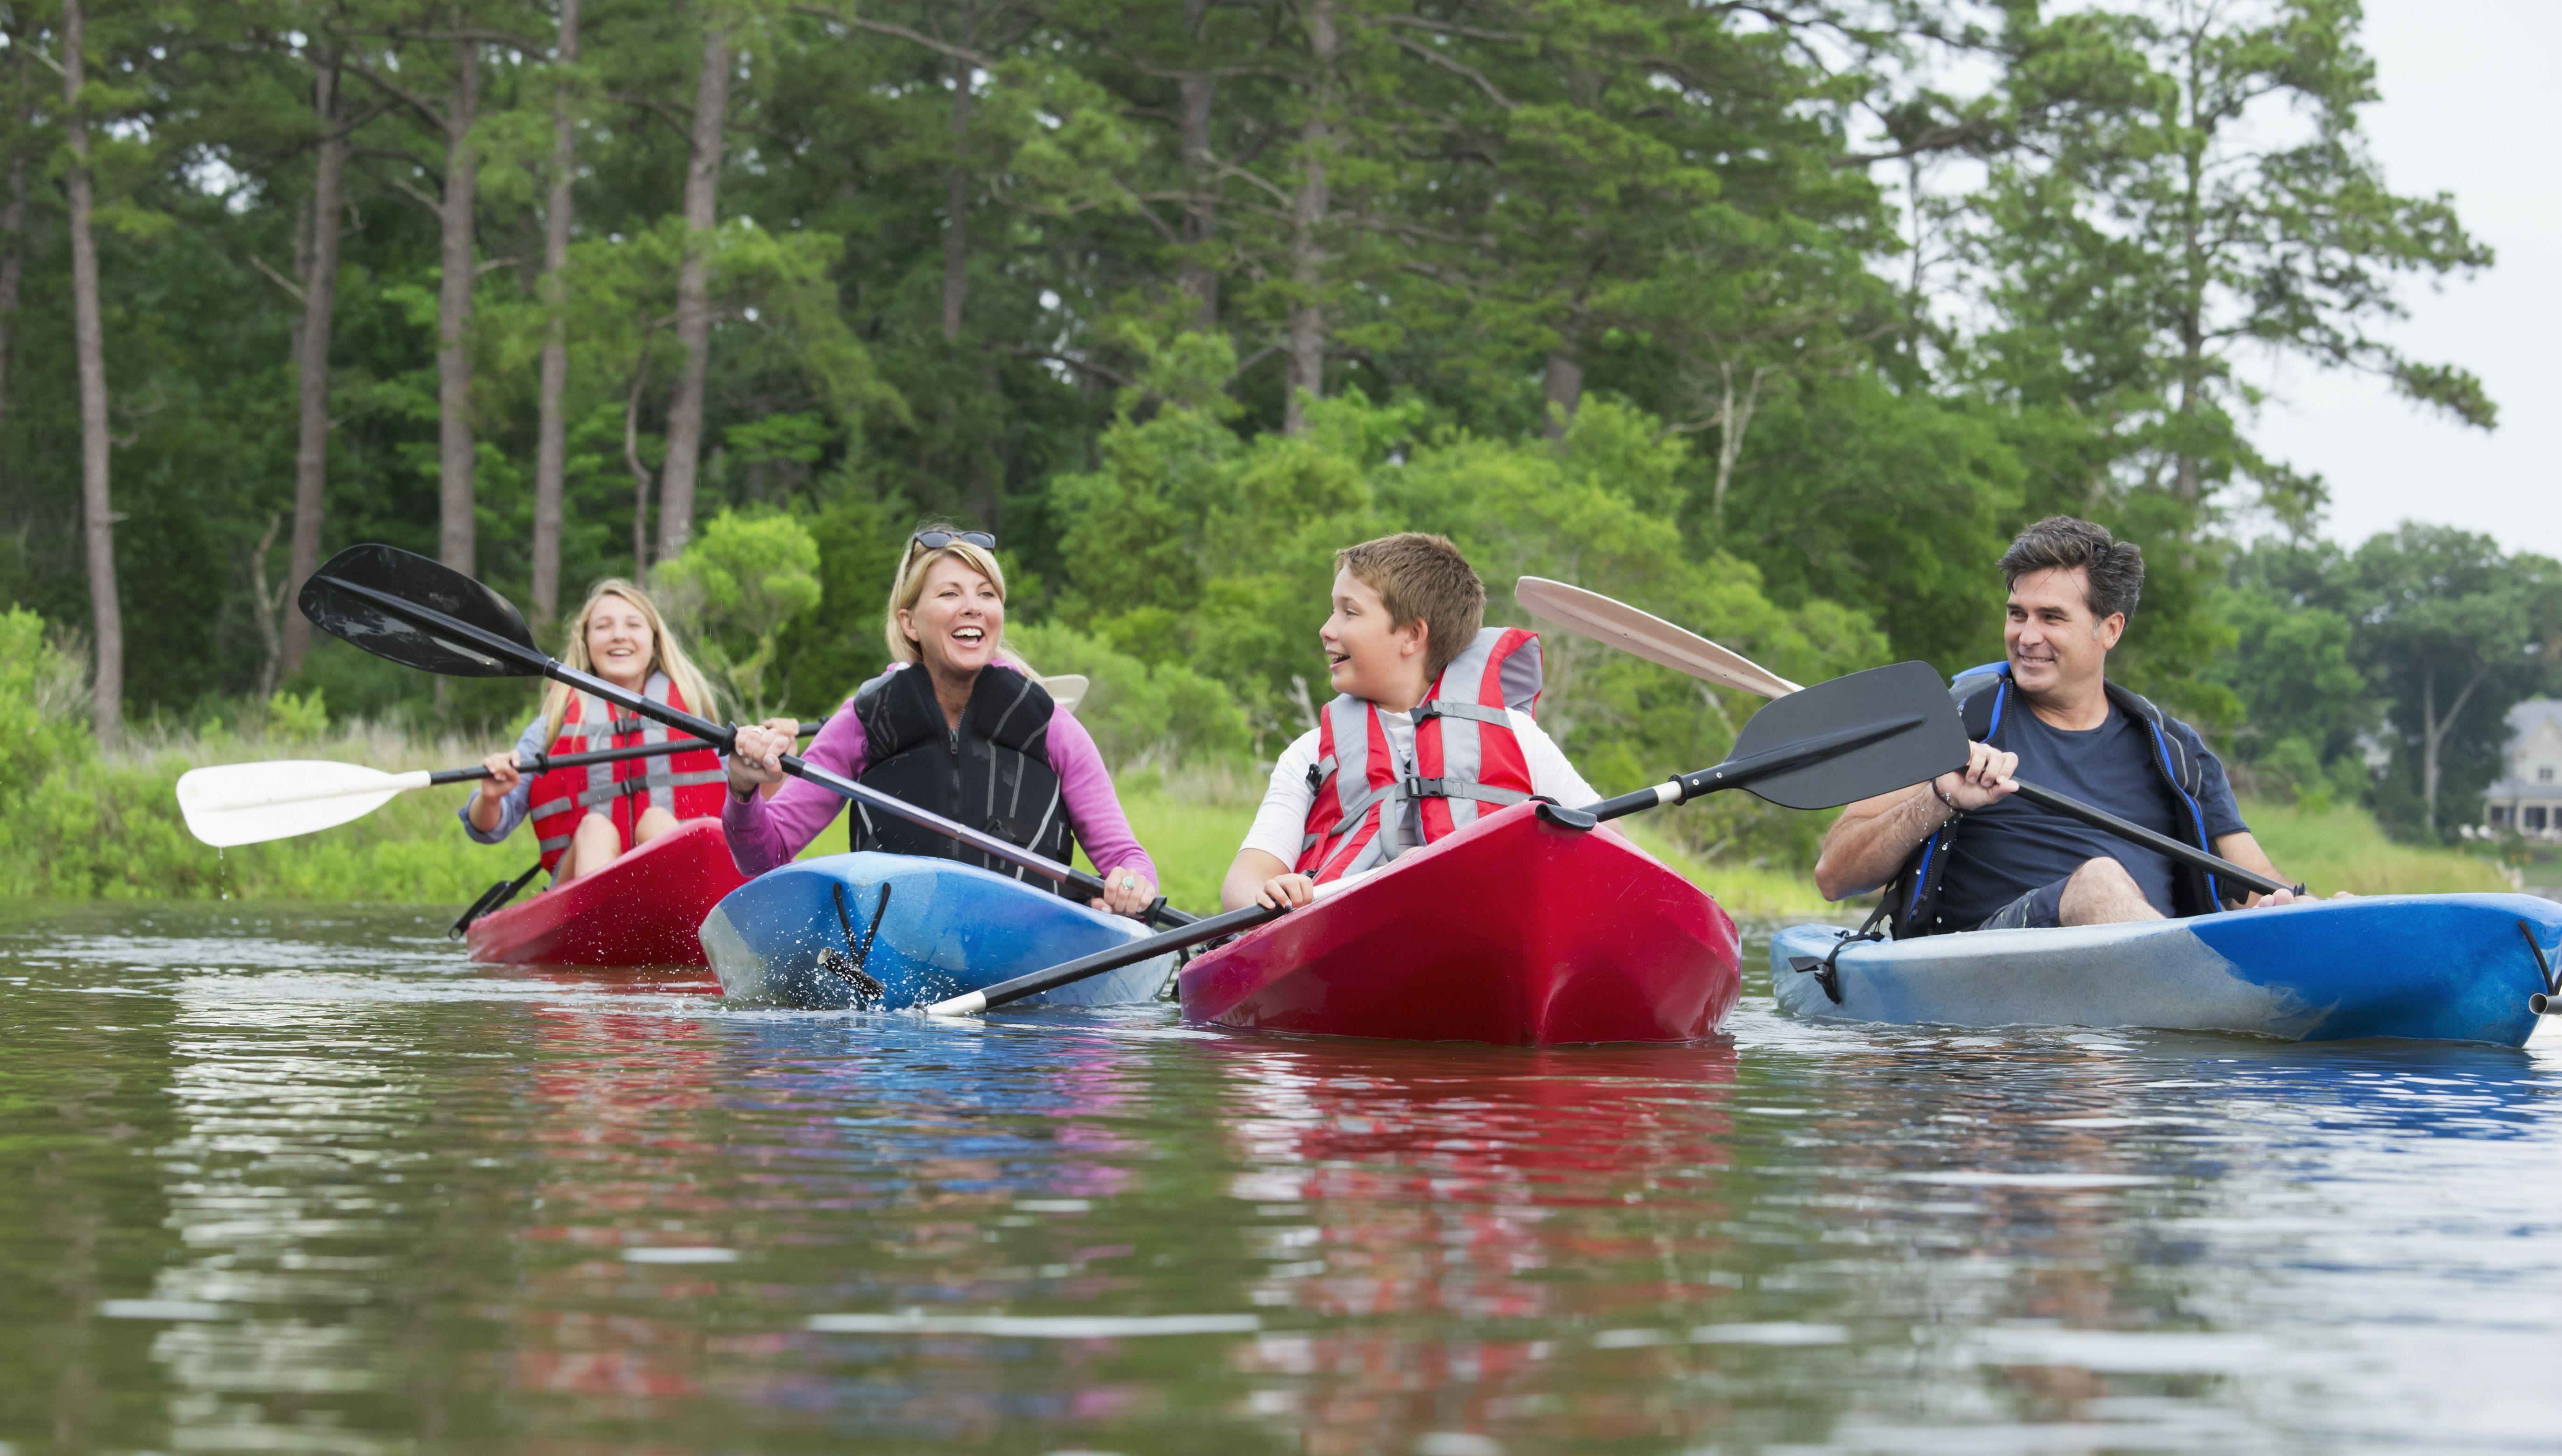 family recreational kayaking in river